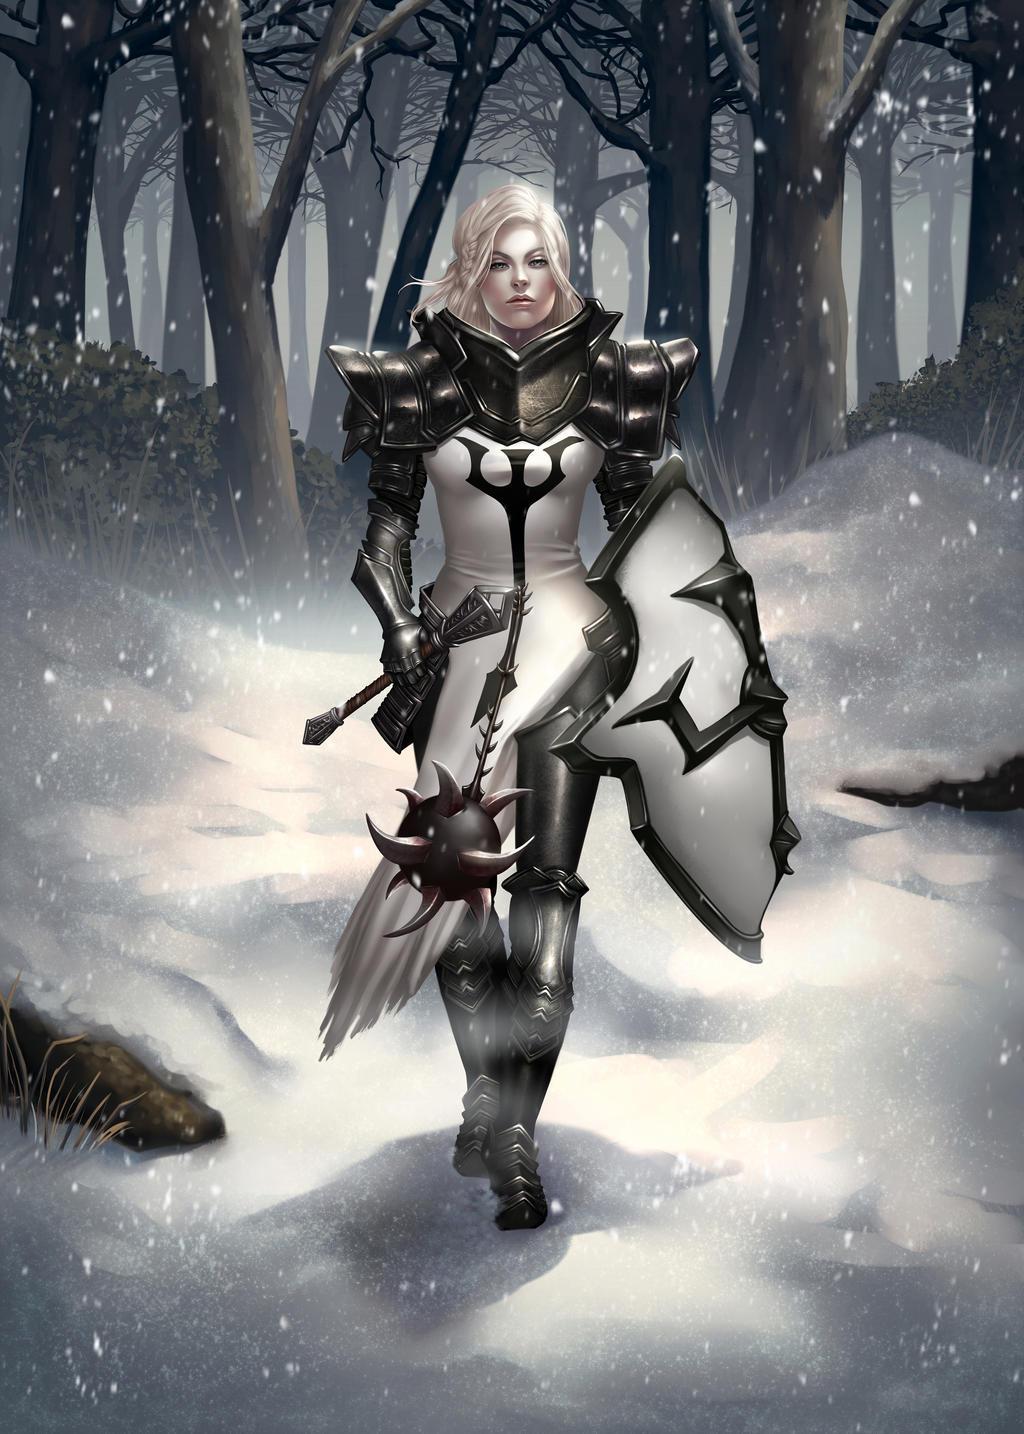 Diablo 3 crusader female nude porn pictures